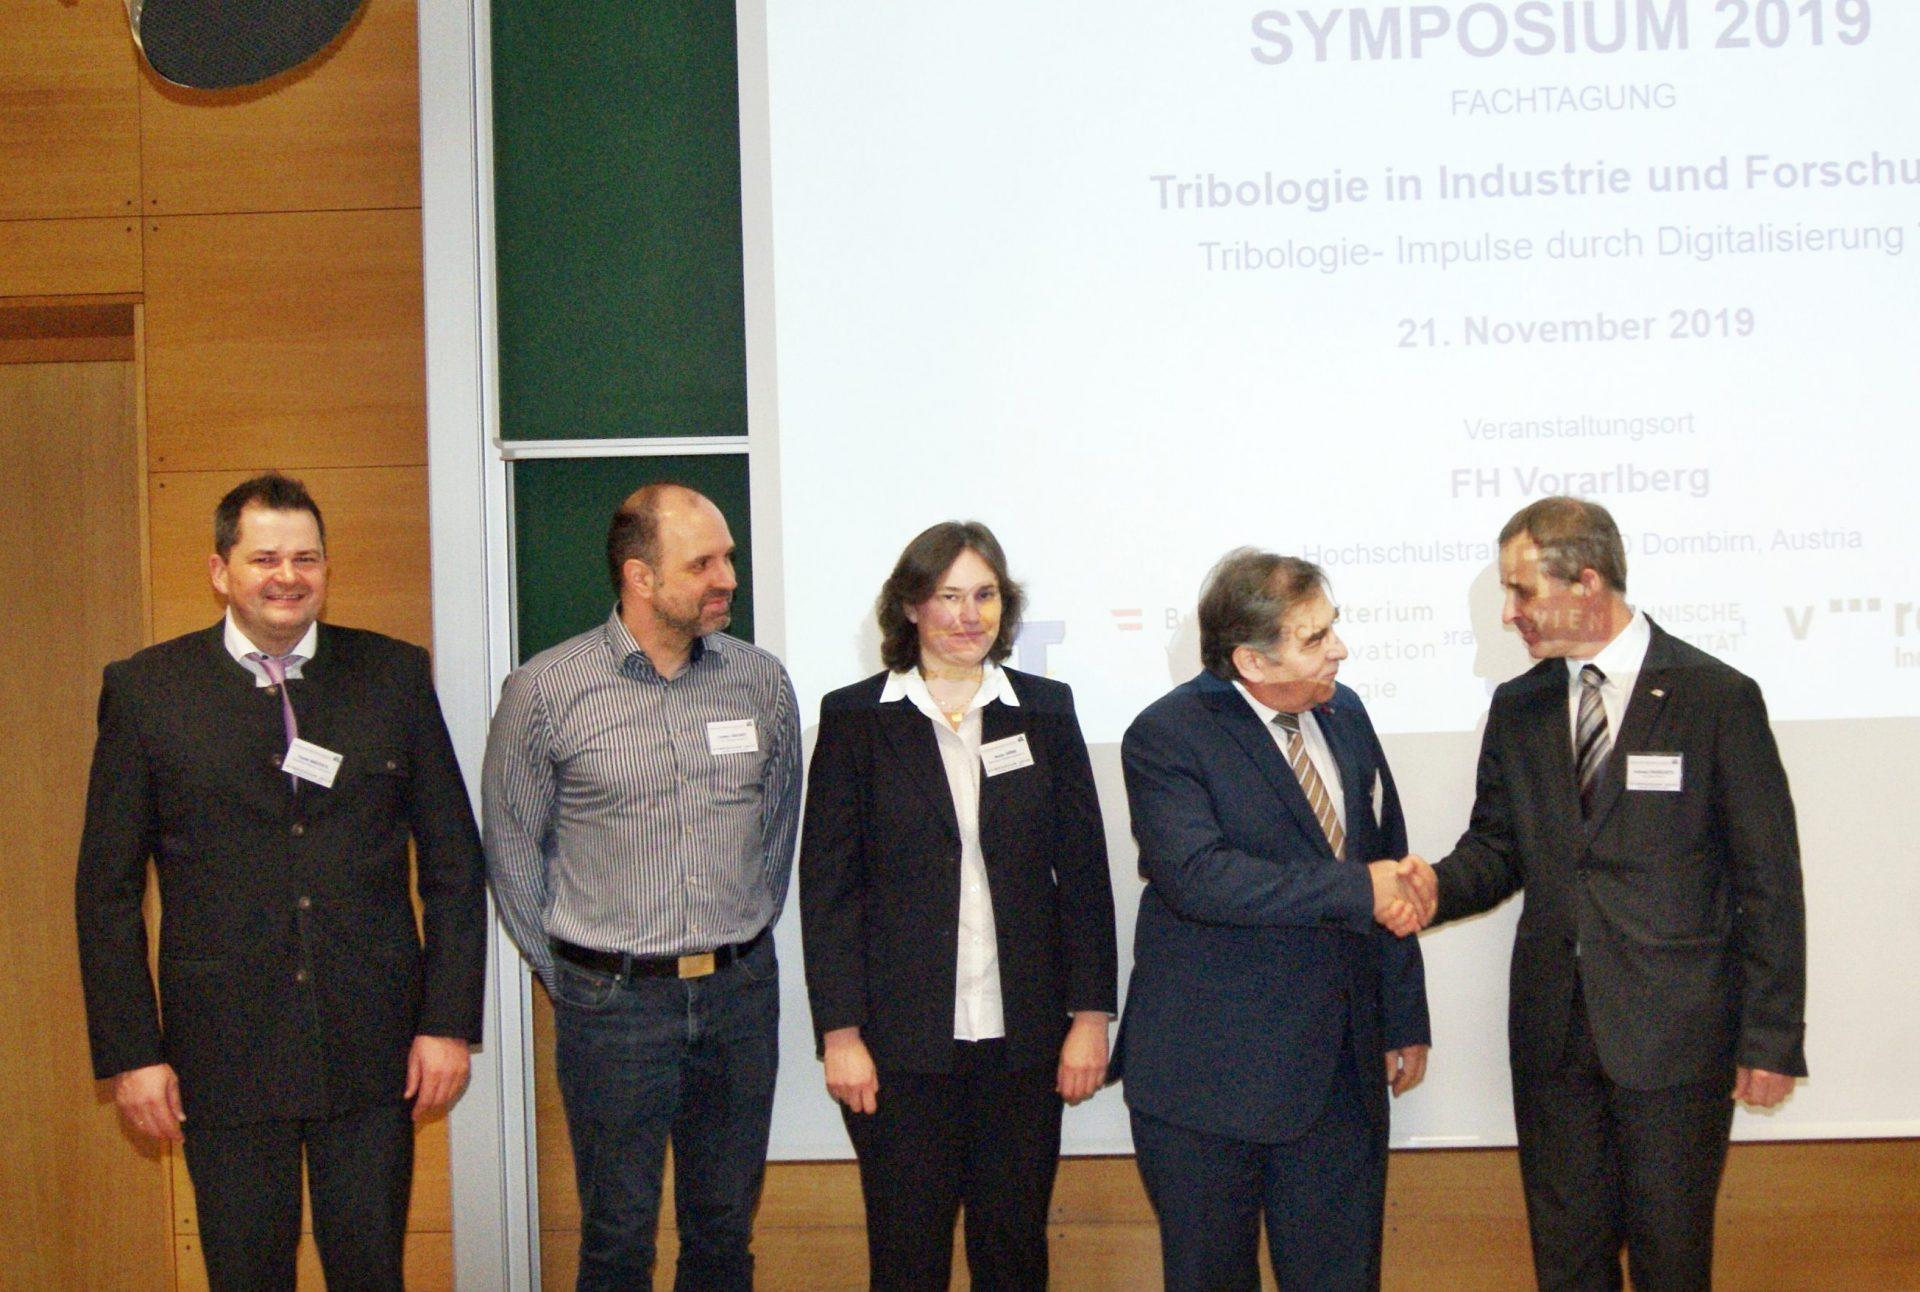 Amtsübergabe: Prof. Pauschitz folgt auf Prof. Franek